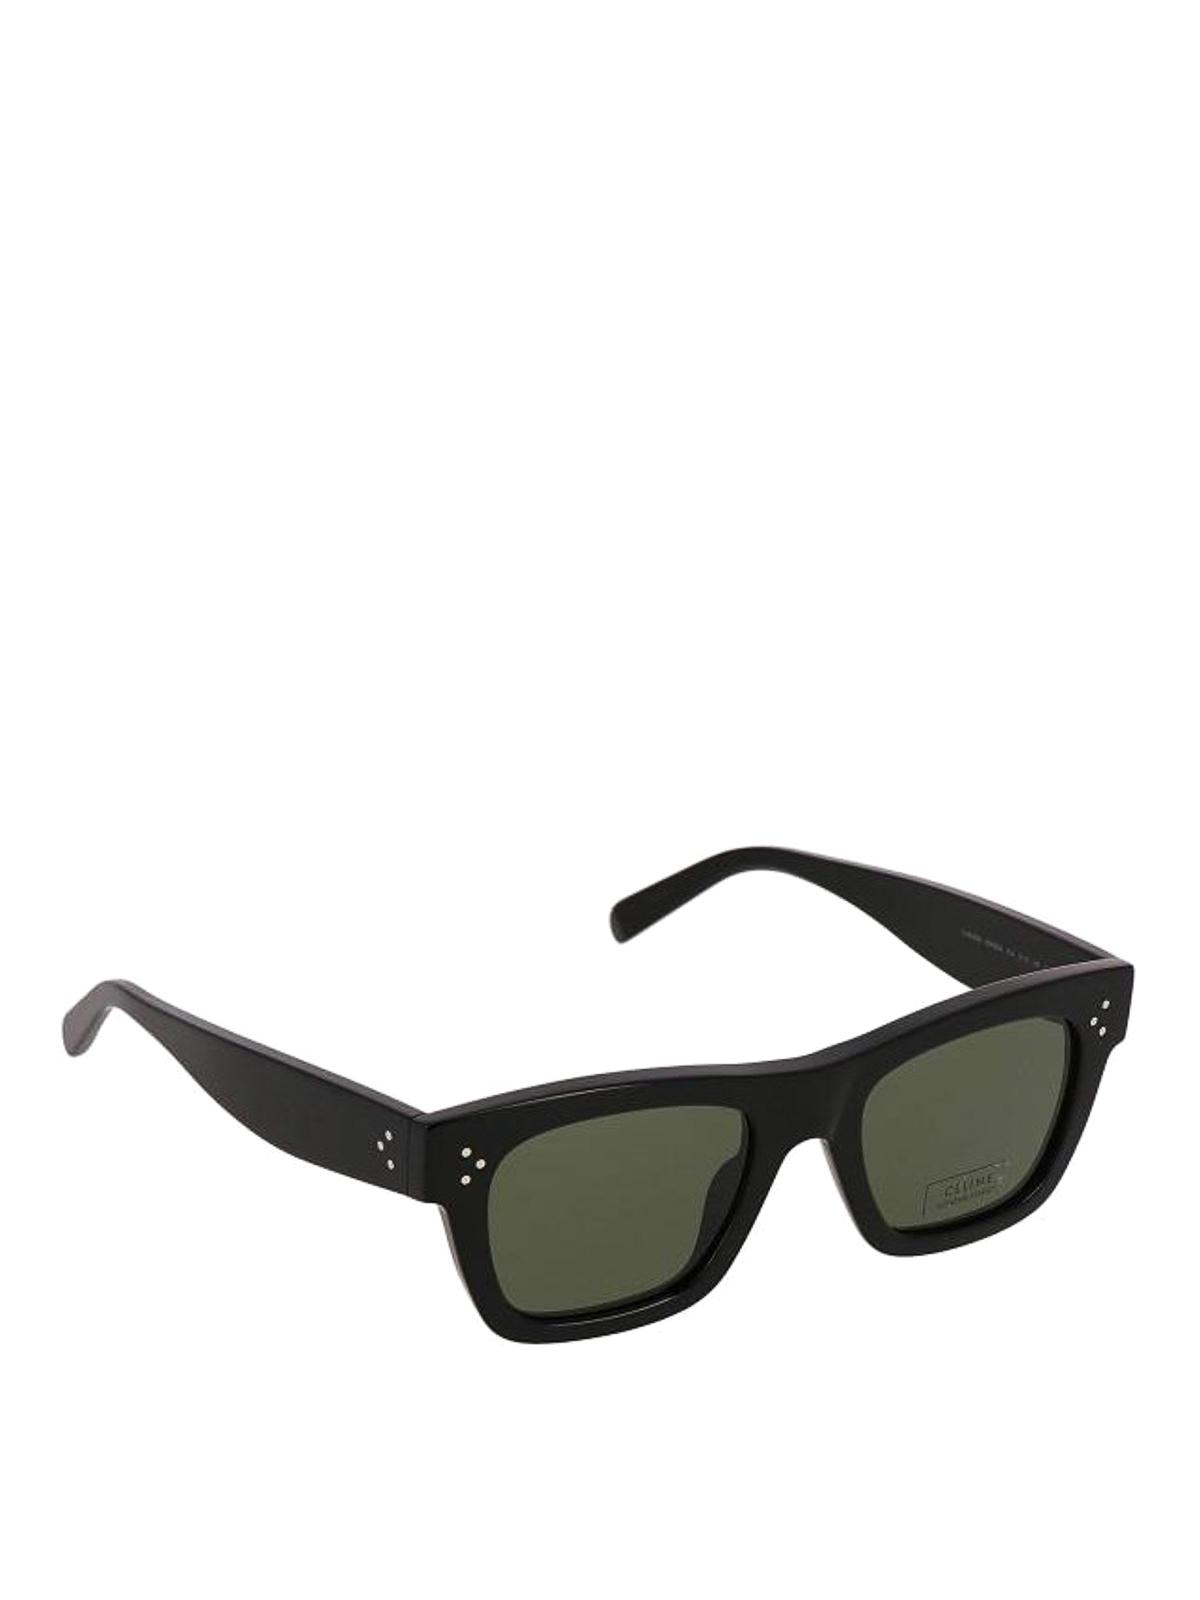 C line occhiali da sole neri rettangolari occhiali da for Occhiali neri da sole